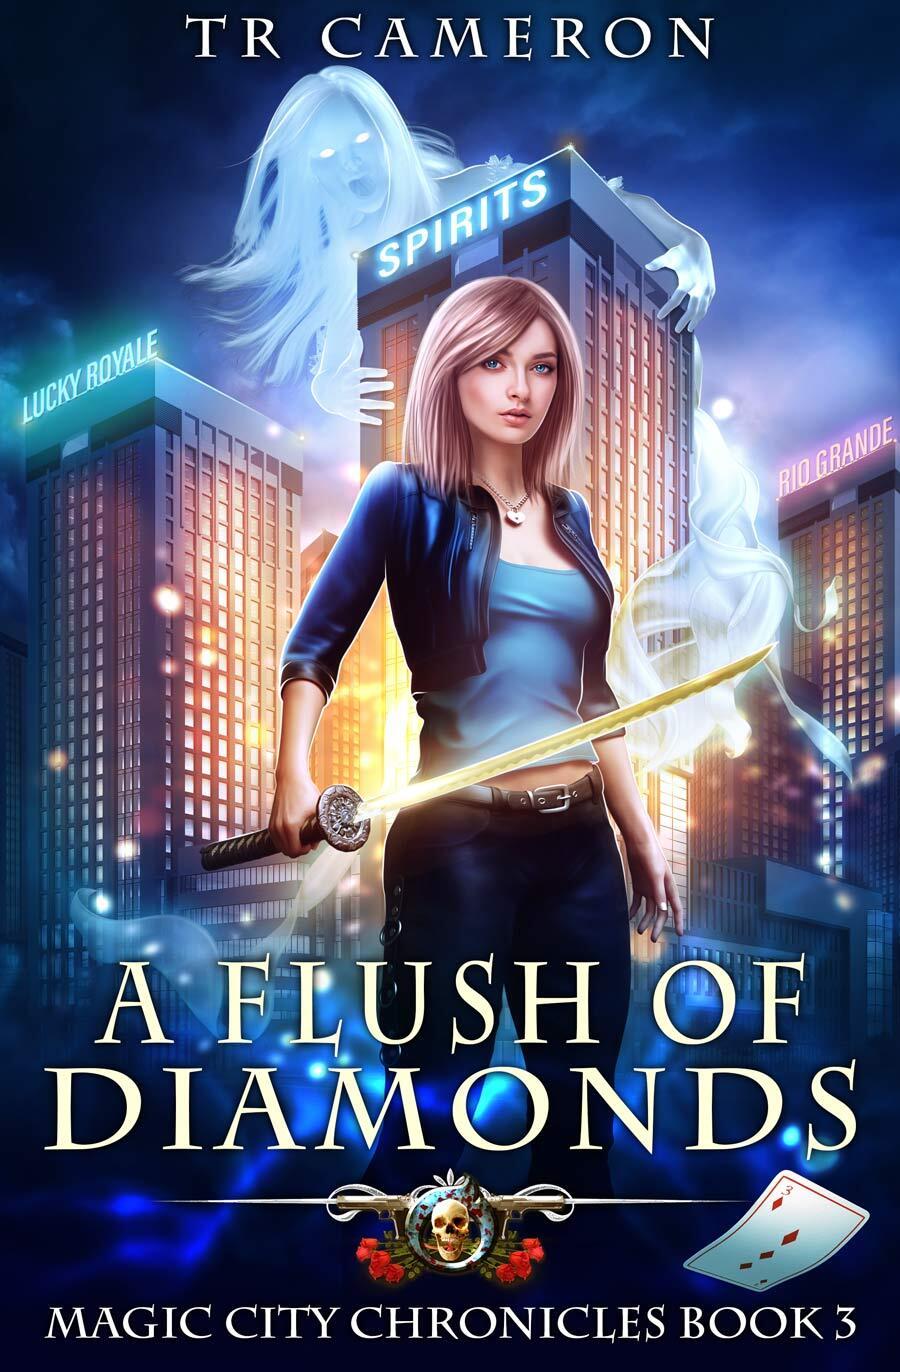 Magic City Chronicles Book 3: A Flush of Diamonds